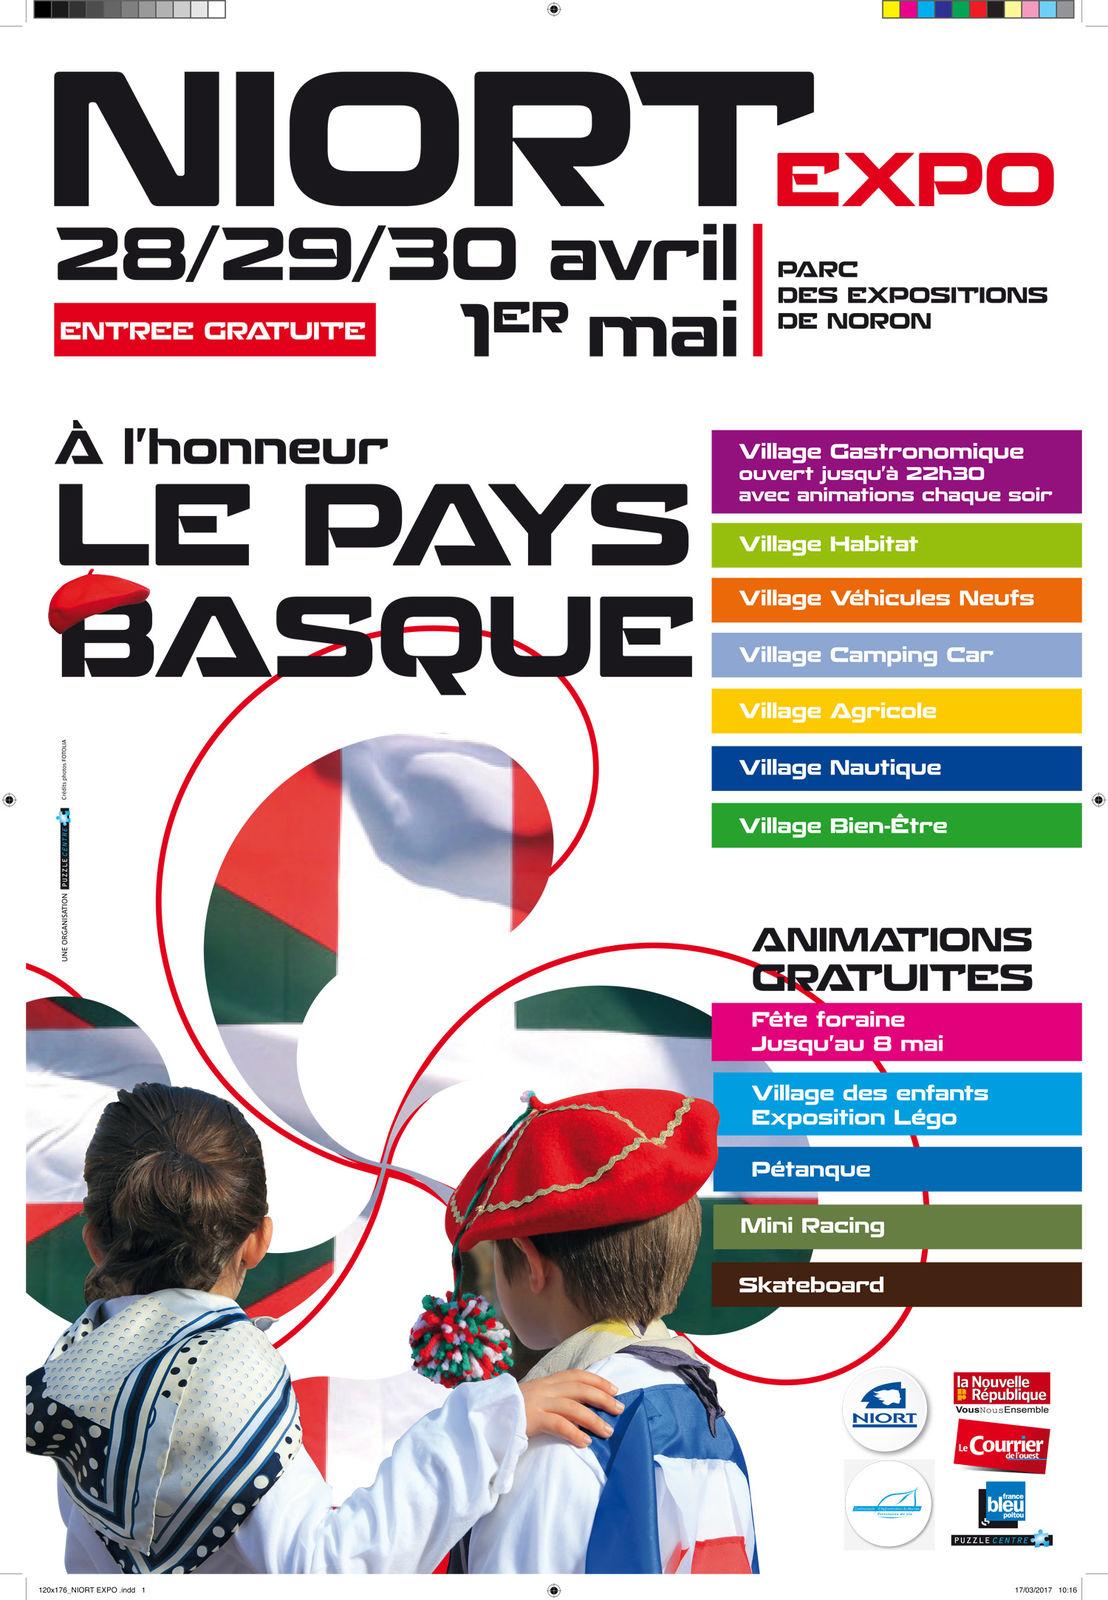 Niort expo mairie de niort for Parc des expositions niort